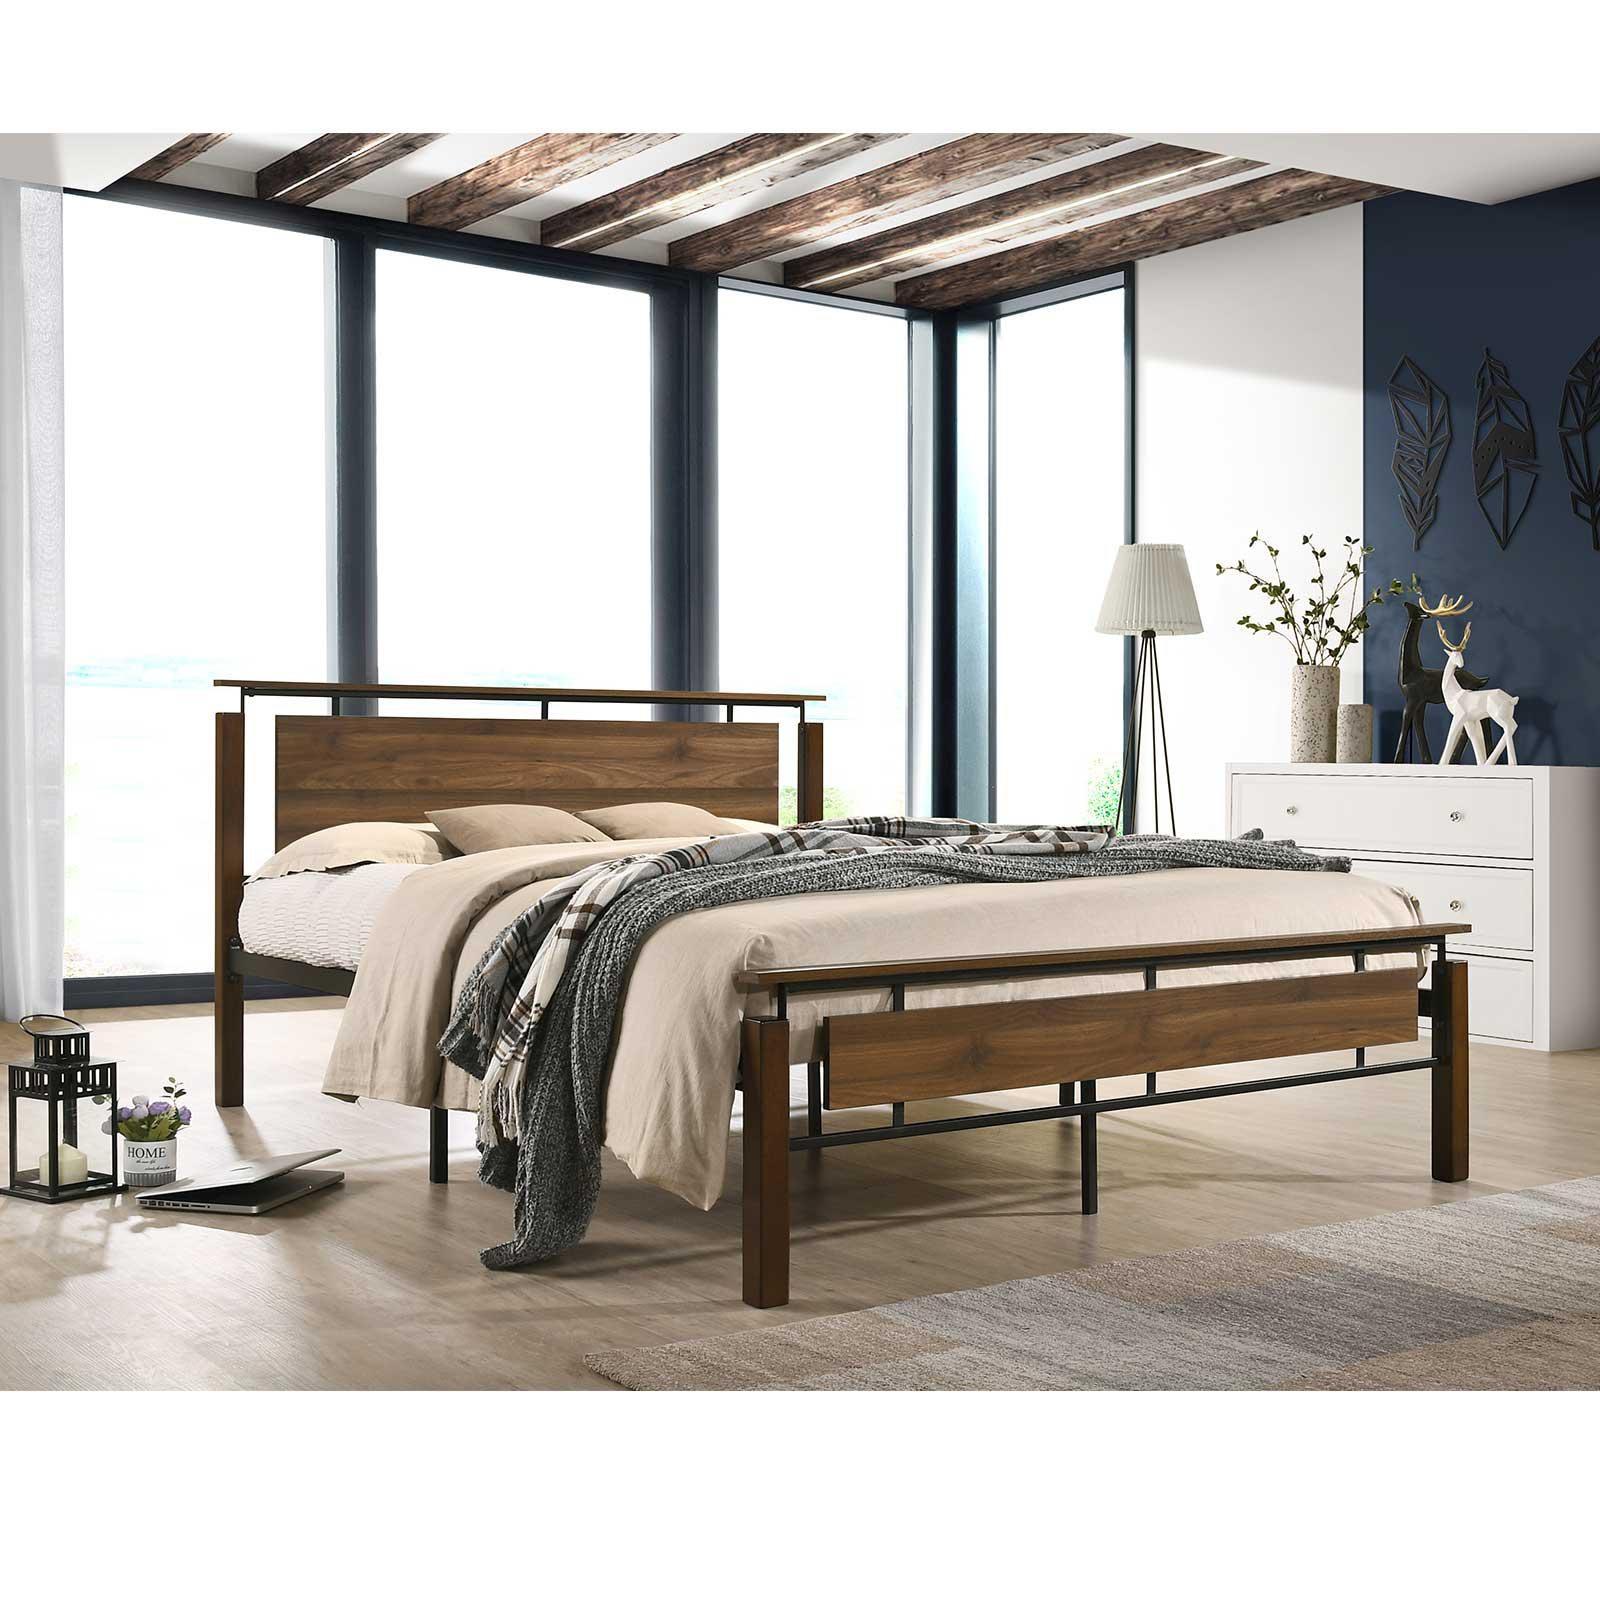 industrial metal bed frame with solid rubberwood platform base queen size bed frames